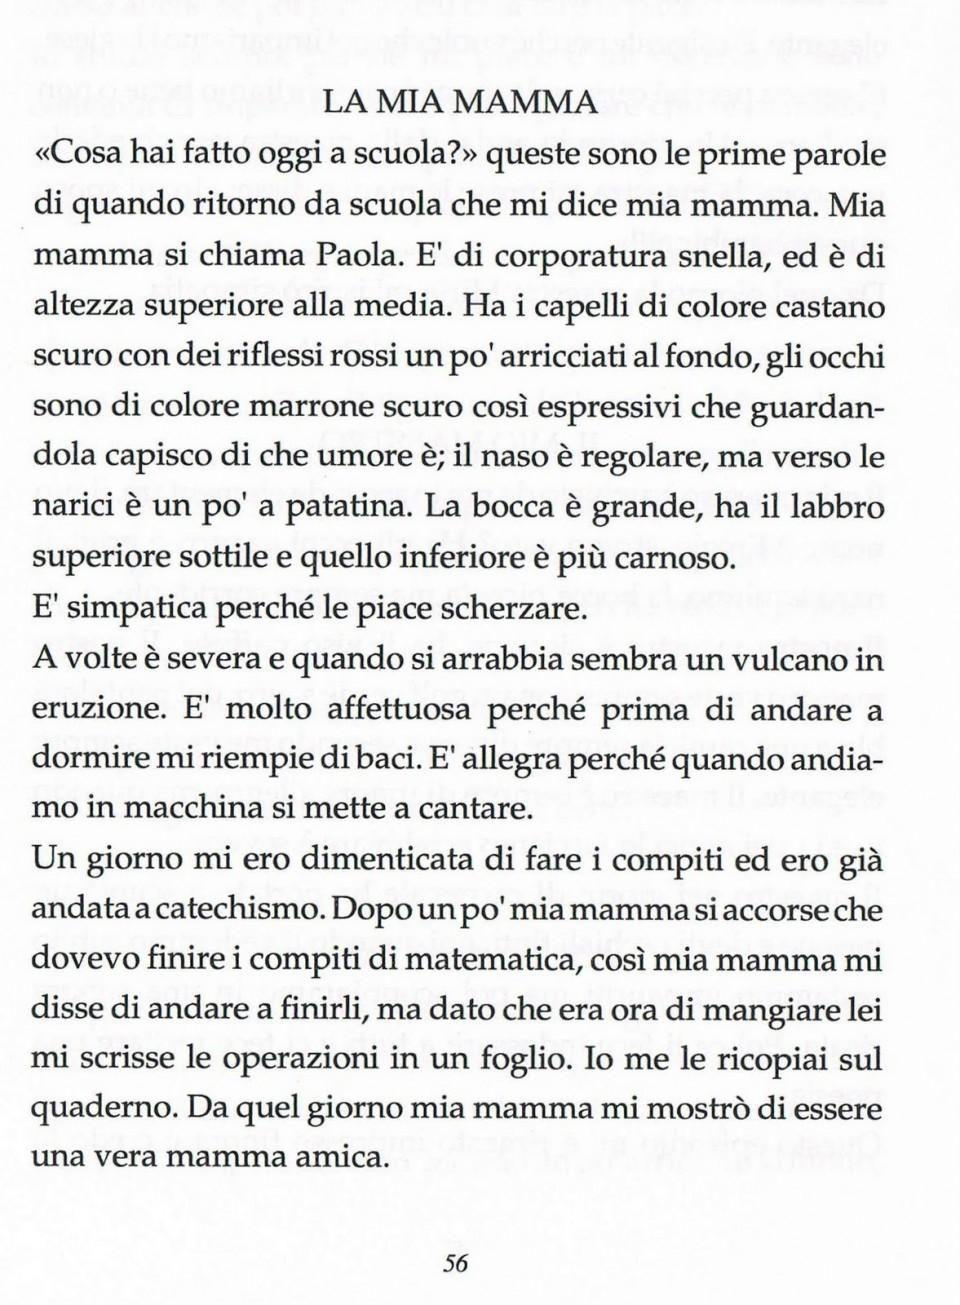 009 Argumentative Essay Euthanasia Academic Argument Example Testo Writing Stirring Pdf Introduction Outline 960